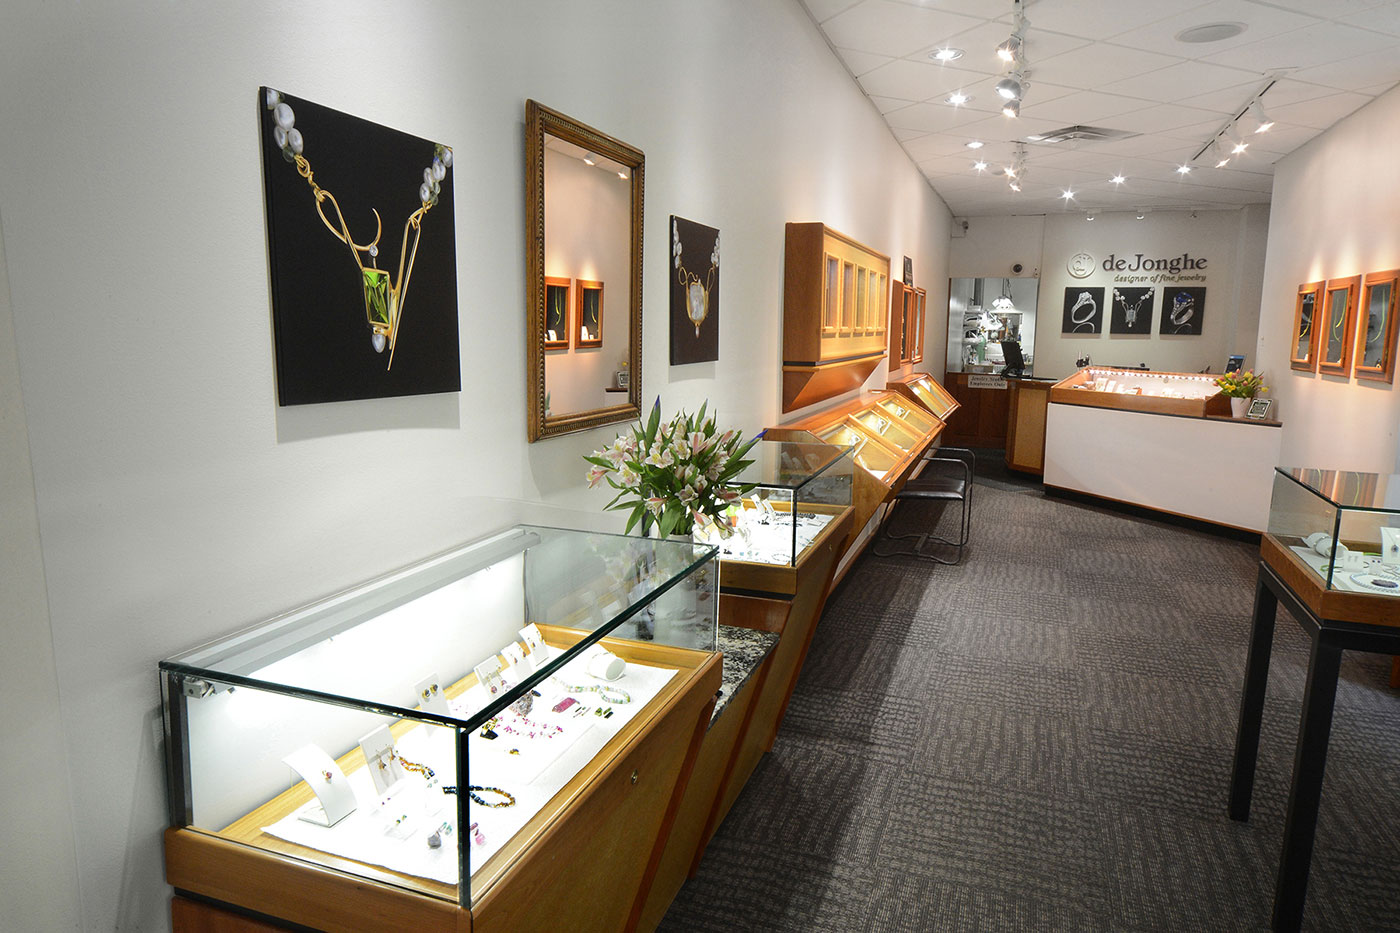 deJonghe Original Jewelry